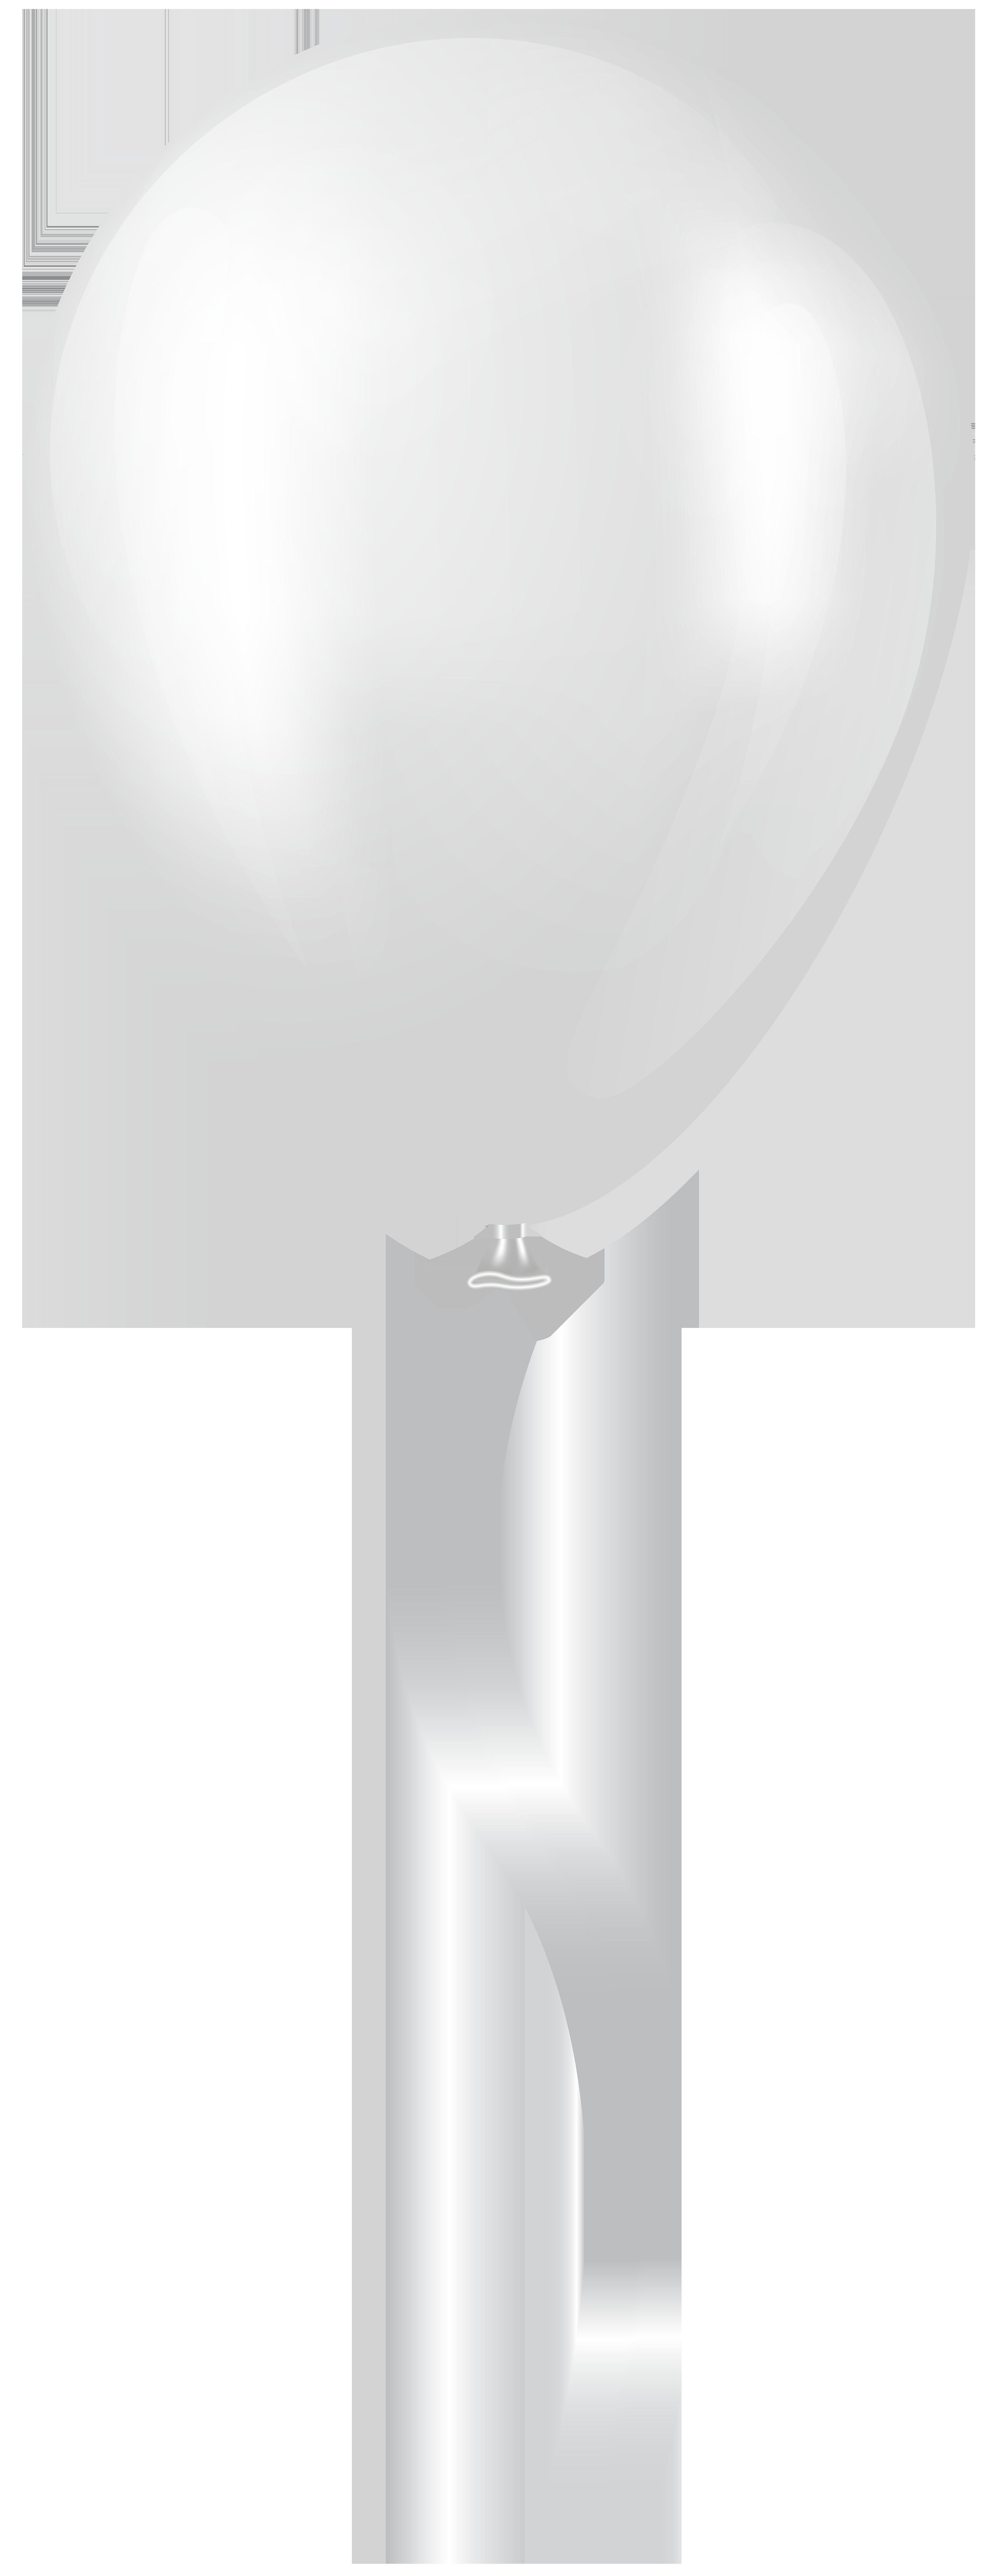 White Balloon Transparent Clip Art.